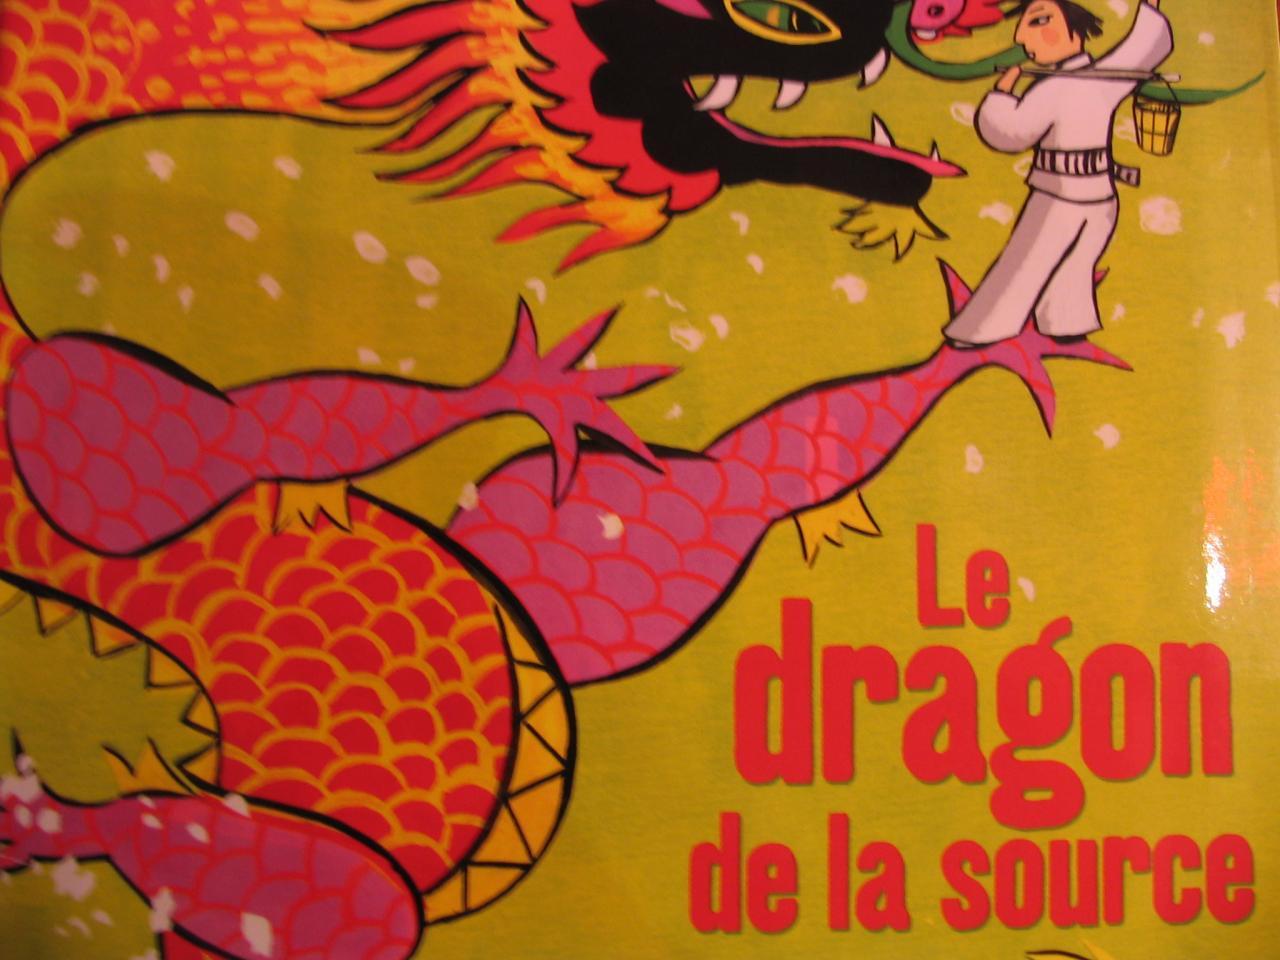 dragon source